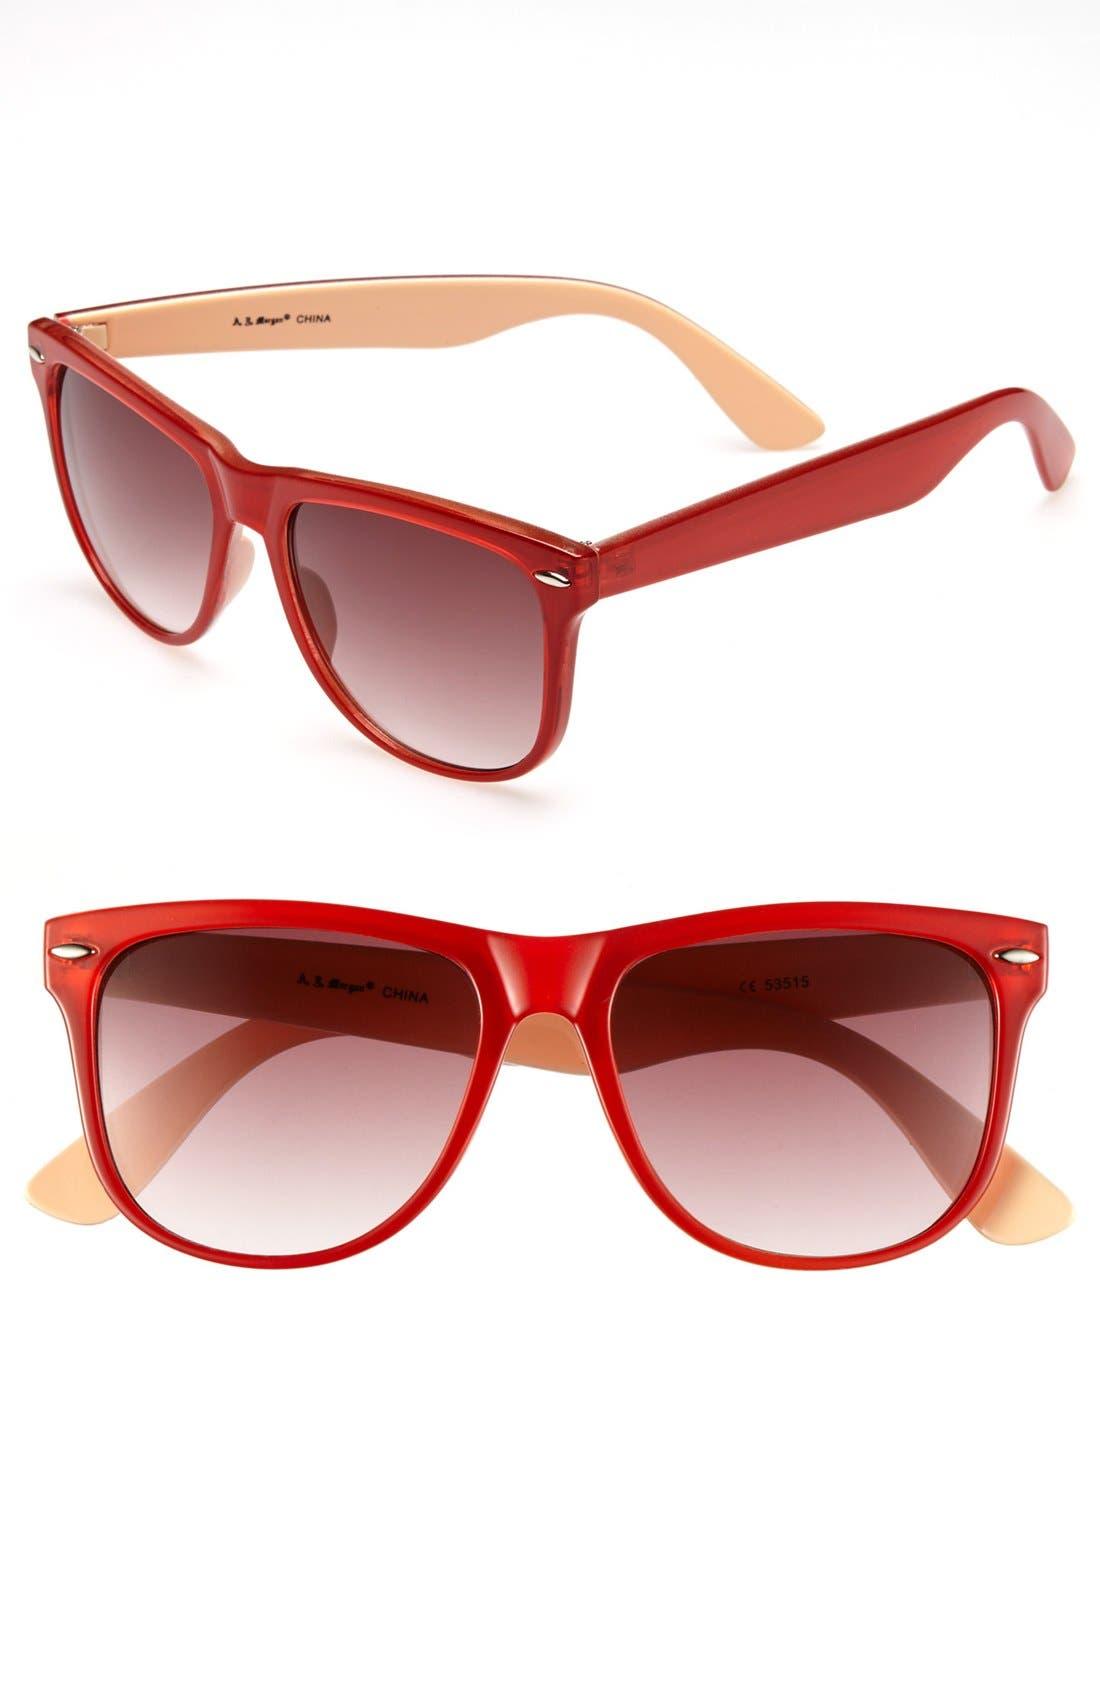 Main Image - A.J. Morgan 'Iced' Sunglasses